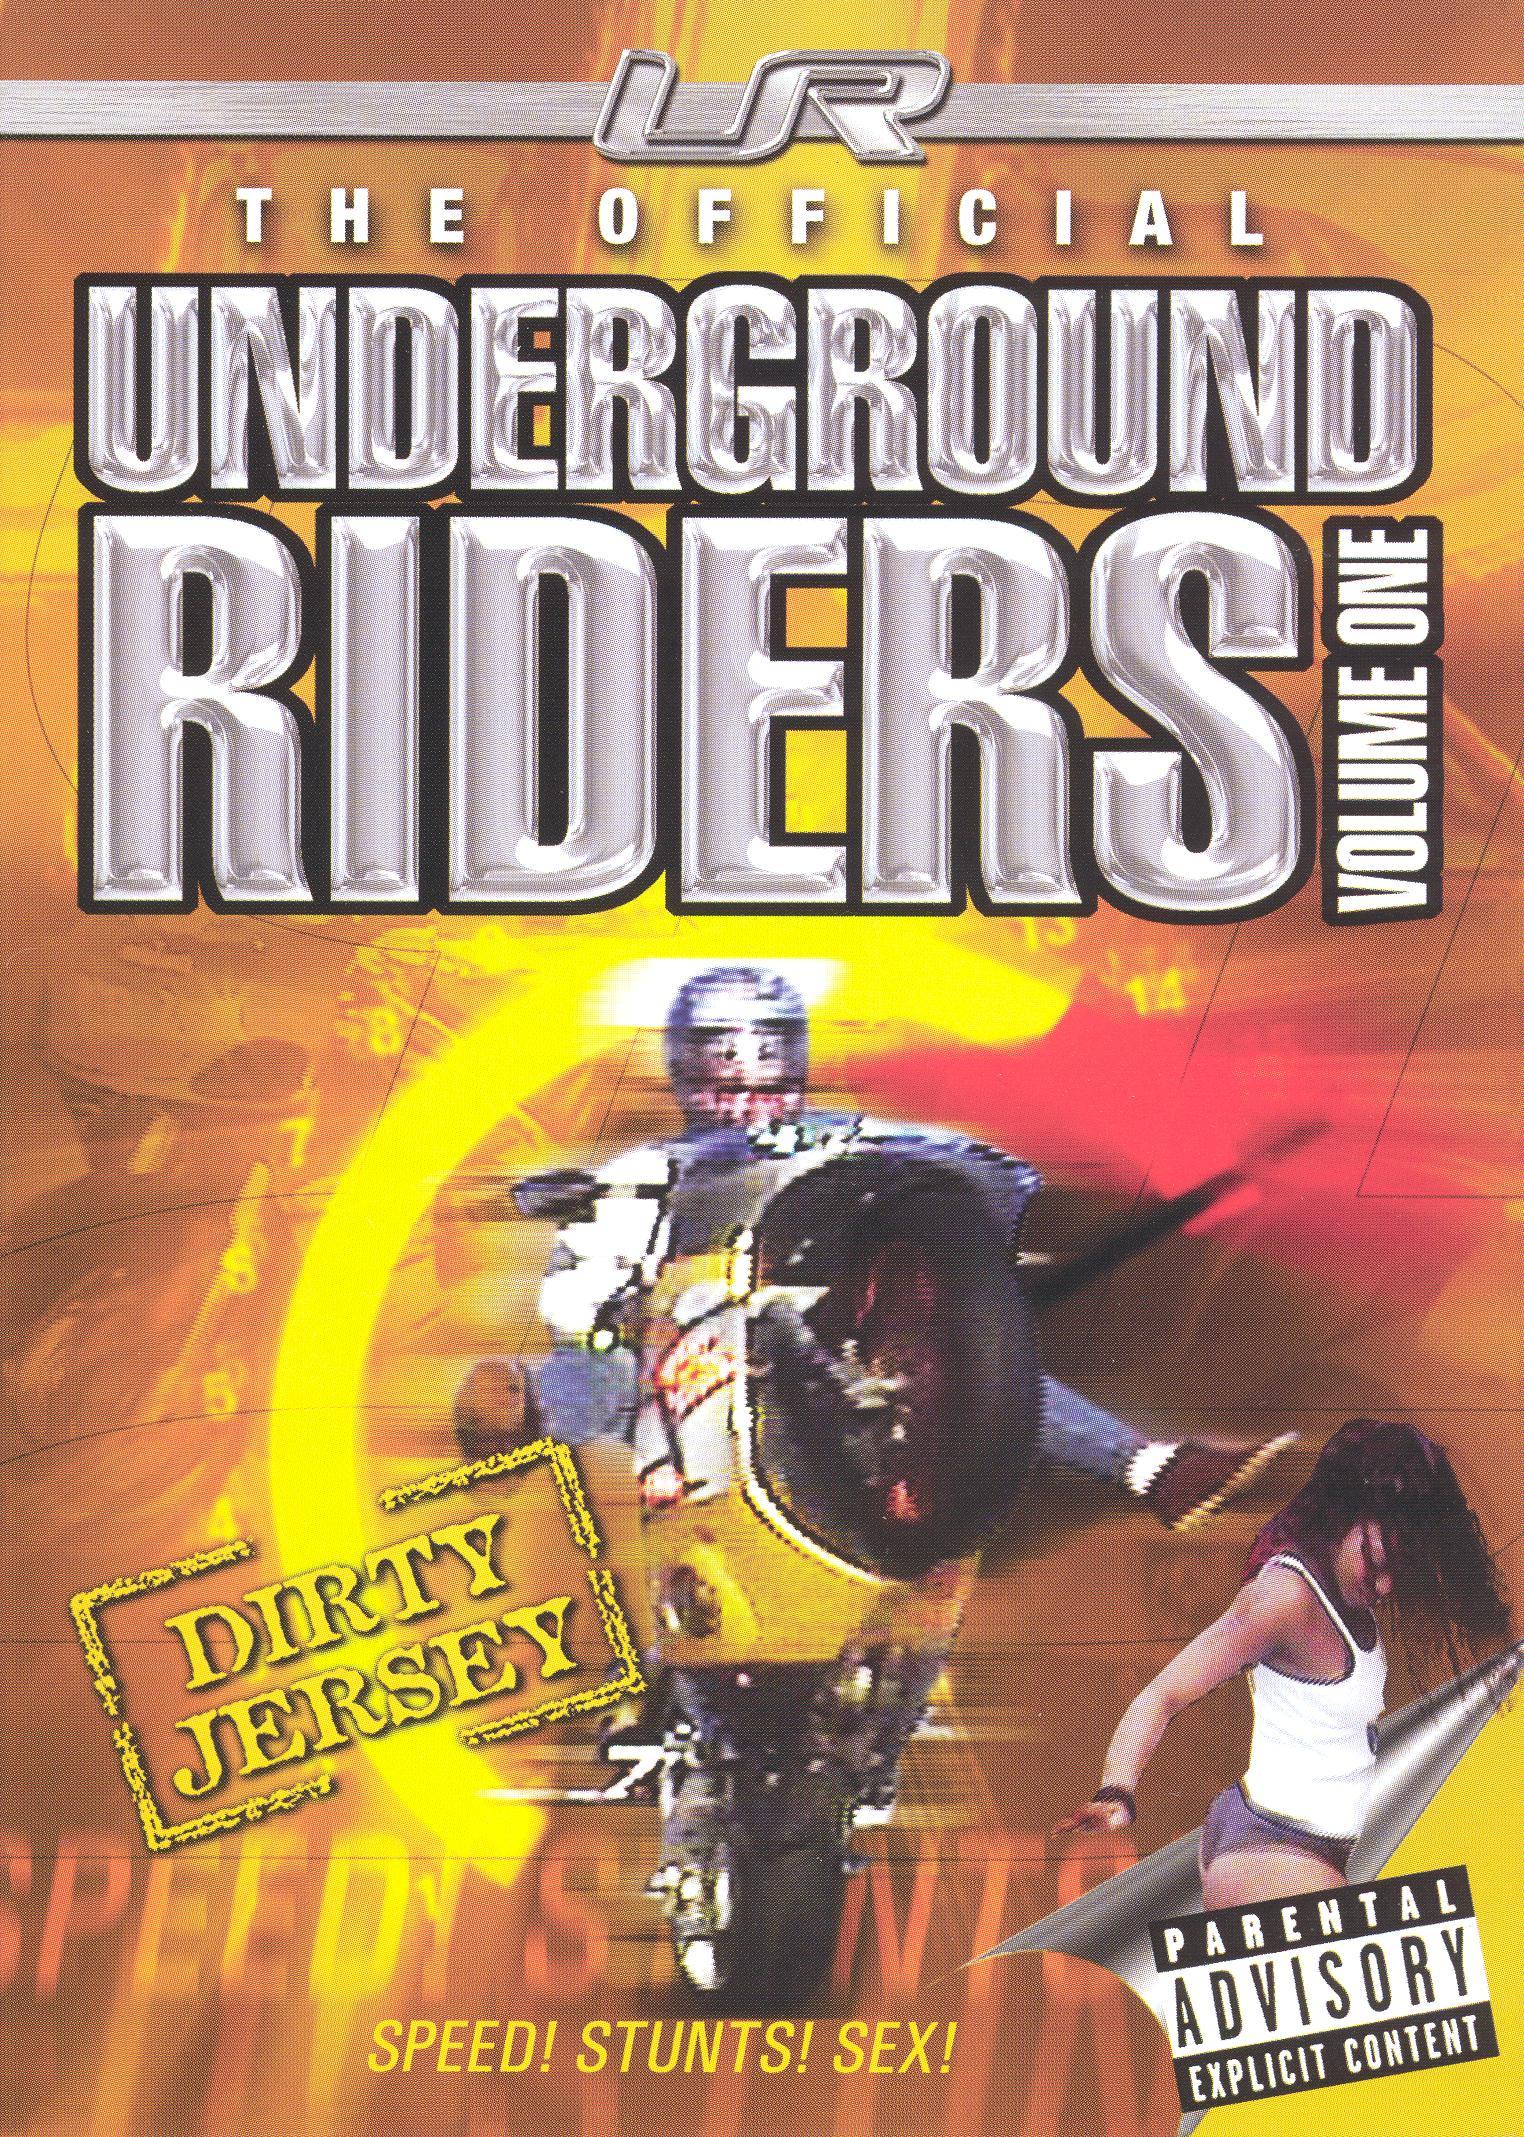 Underground Riders, Vol. 1